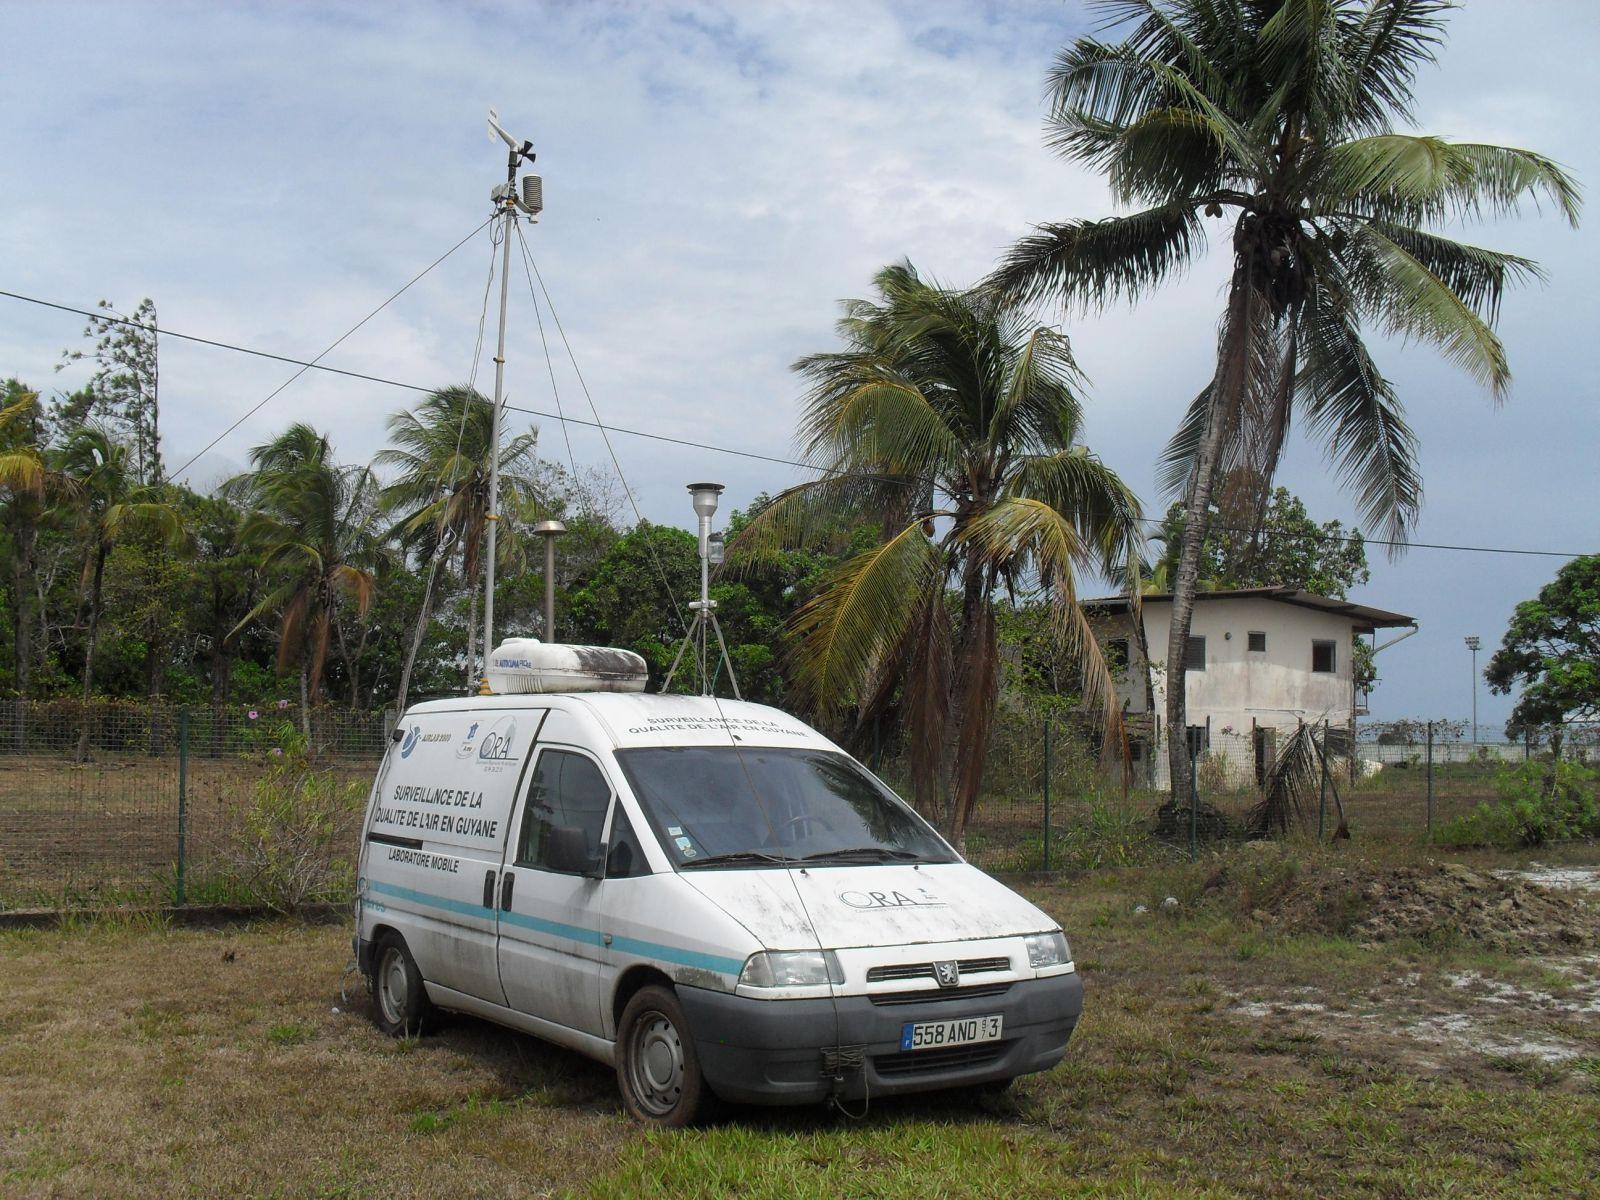 La station mobile